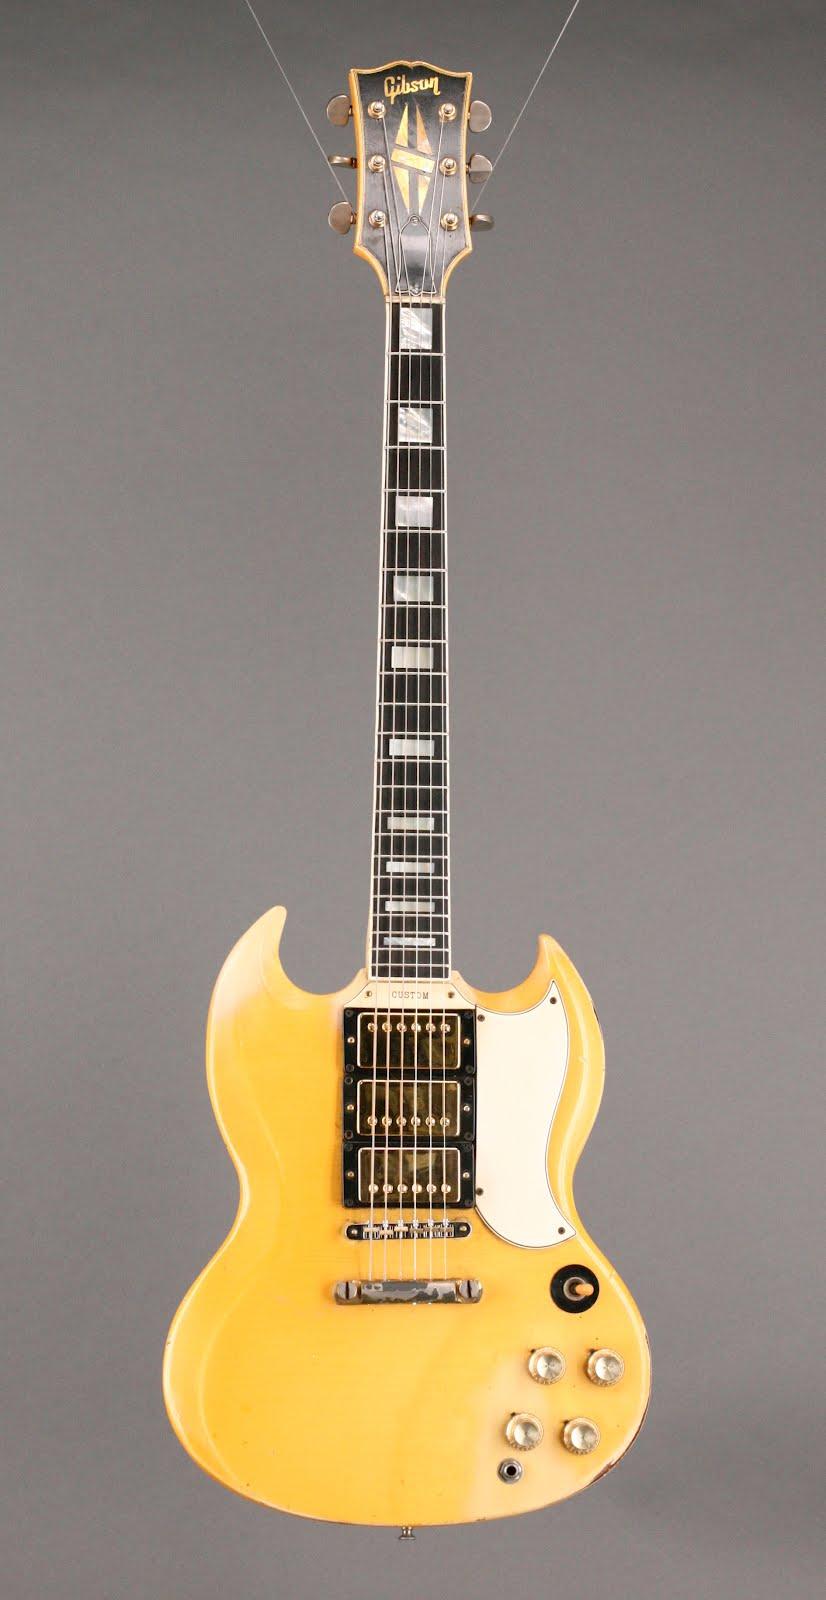 guitars a go go 1965 gibson sg custom. Black Bedroom Furniture Sets. Home Design Ideas